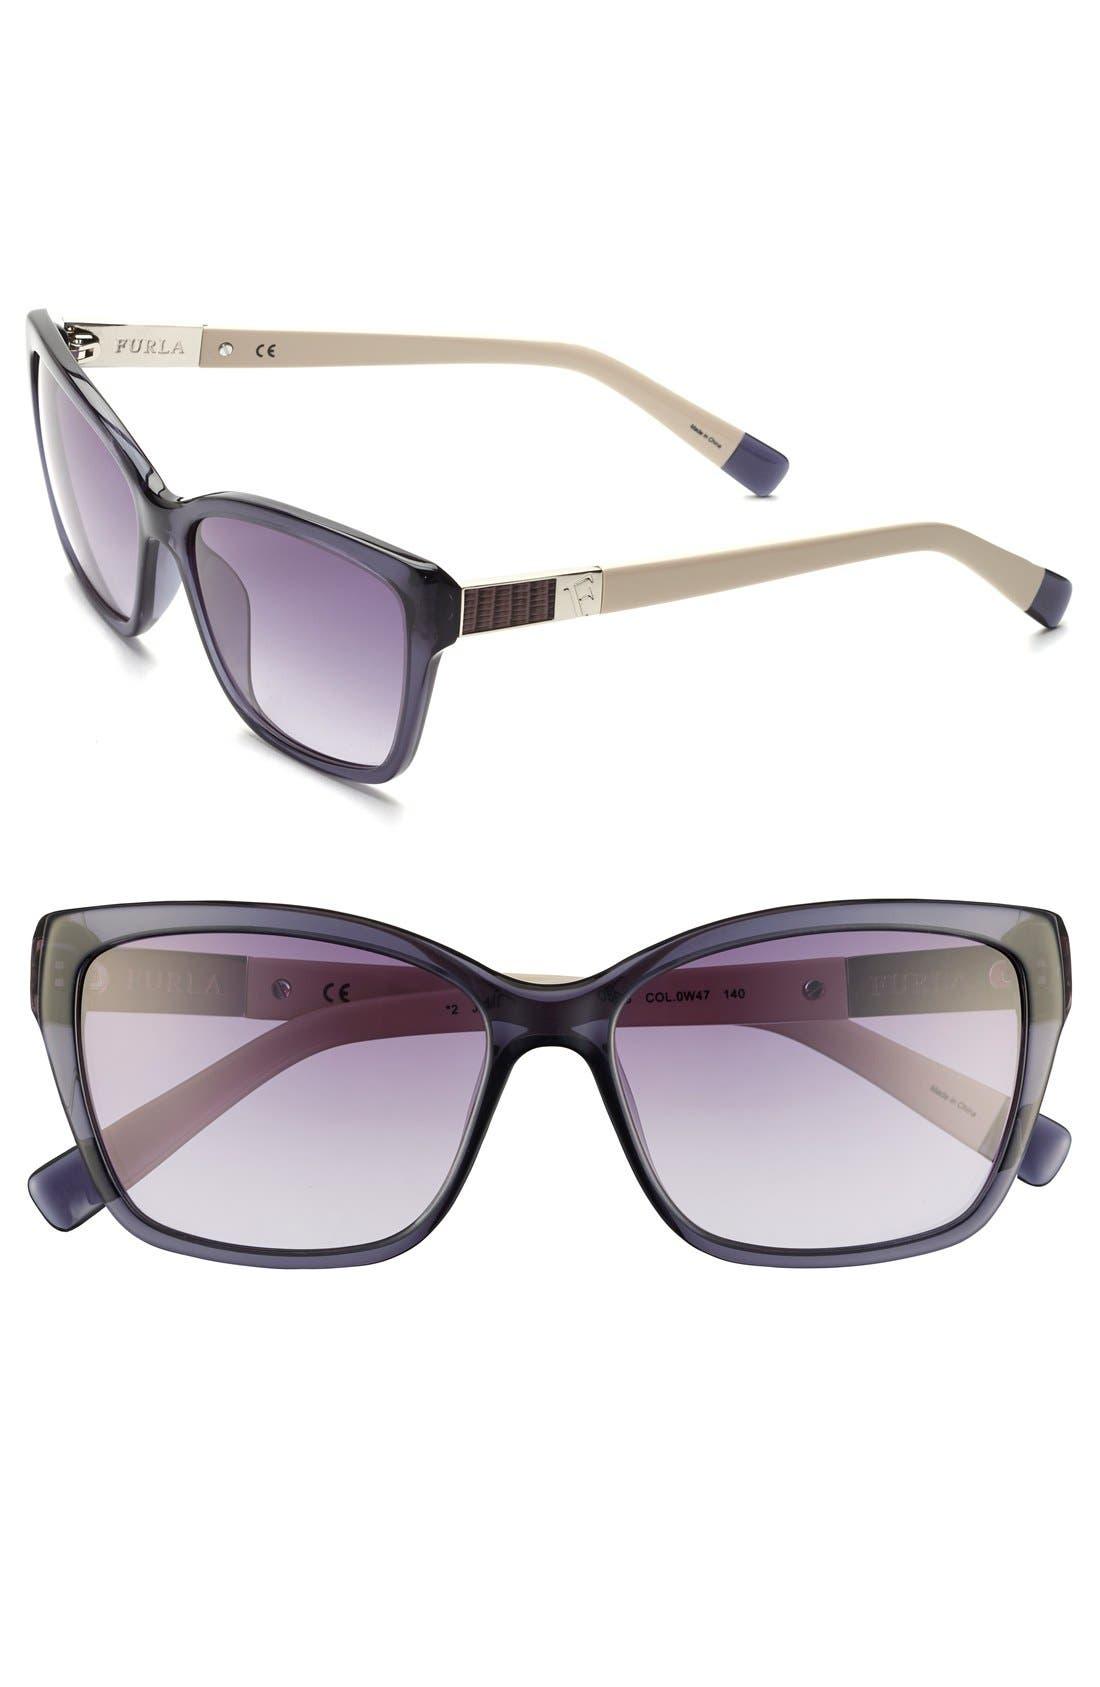 Main Image - Furla 56mm Leather Insert Sunglasses